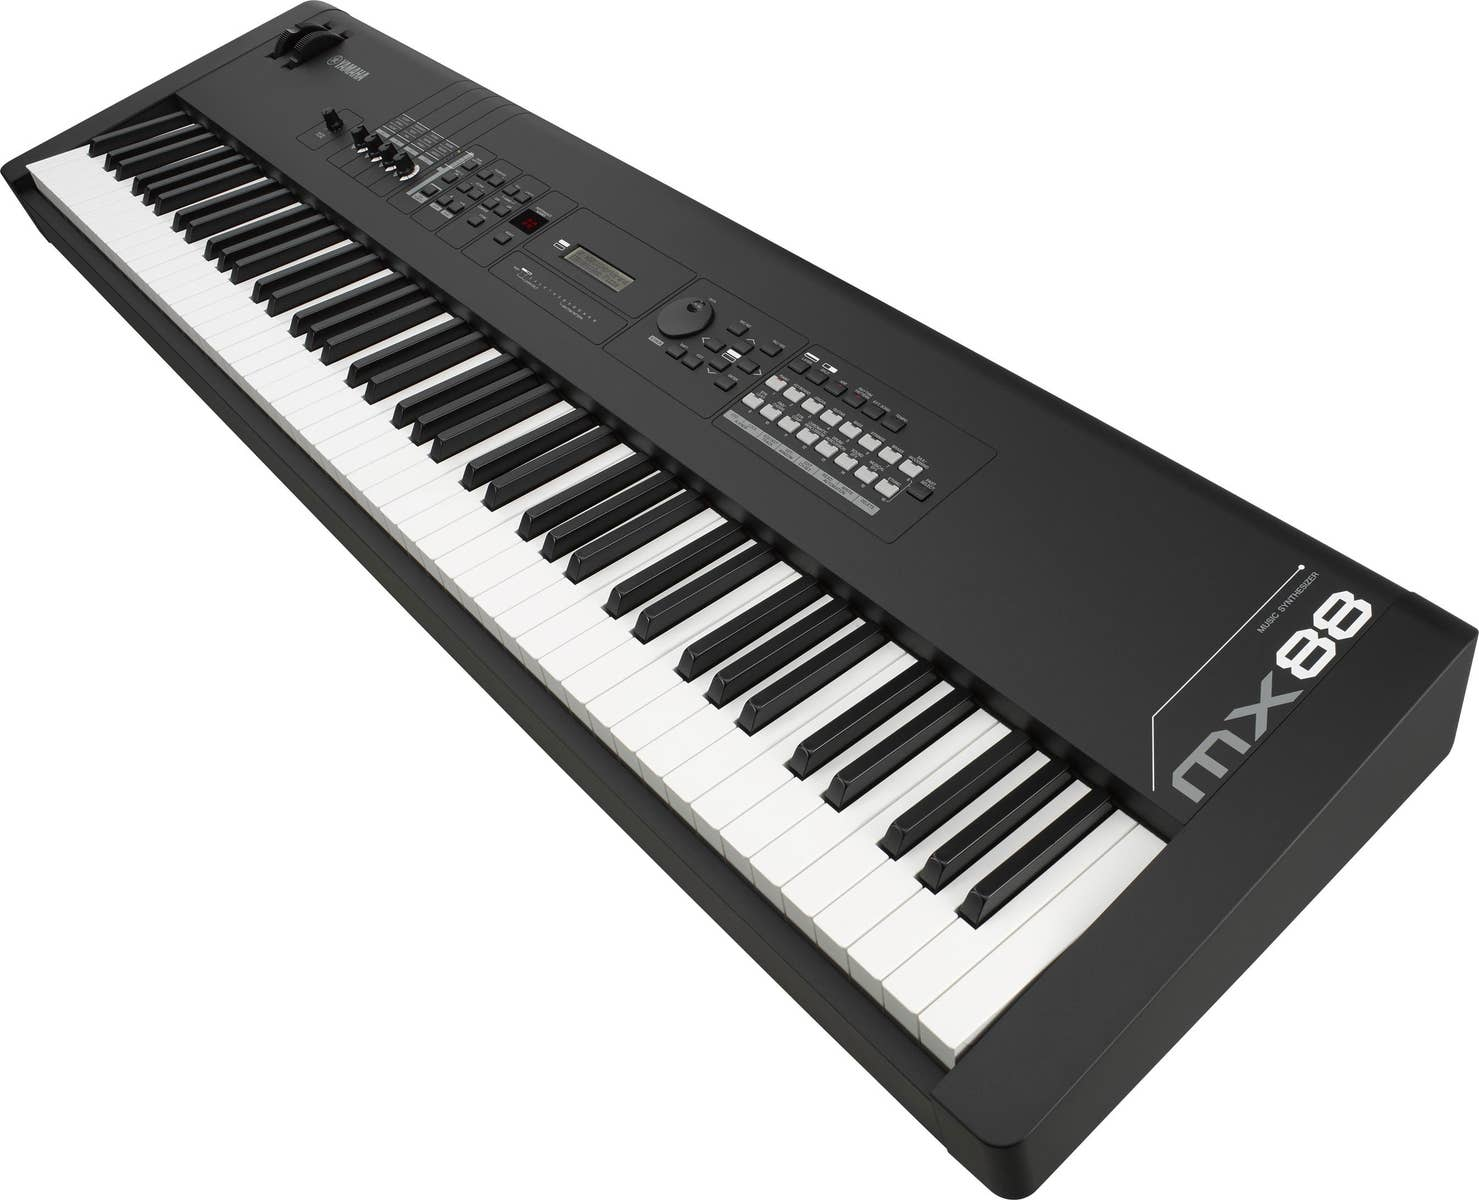 Yamaha MX88 BK 88-note Keyboard Synthesizer w/MOTIF sounds - Black